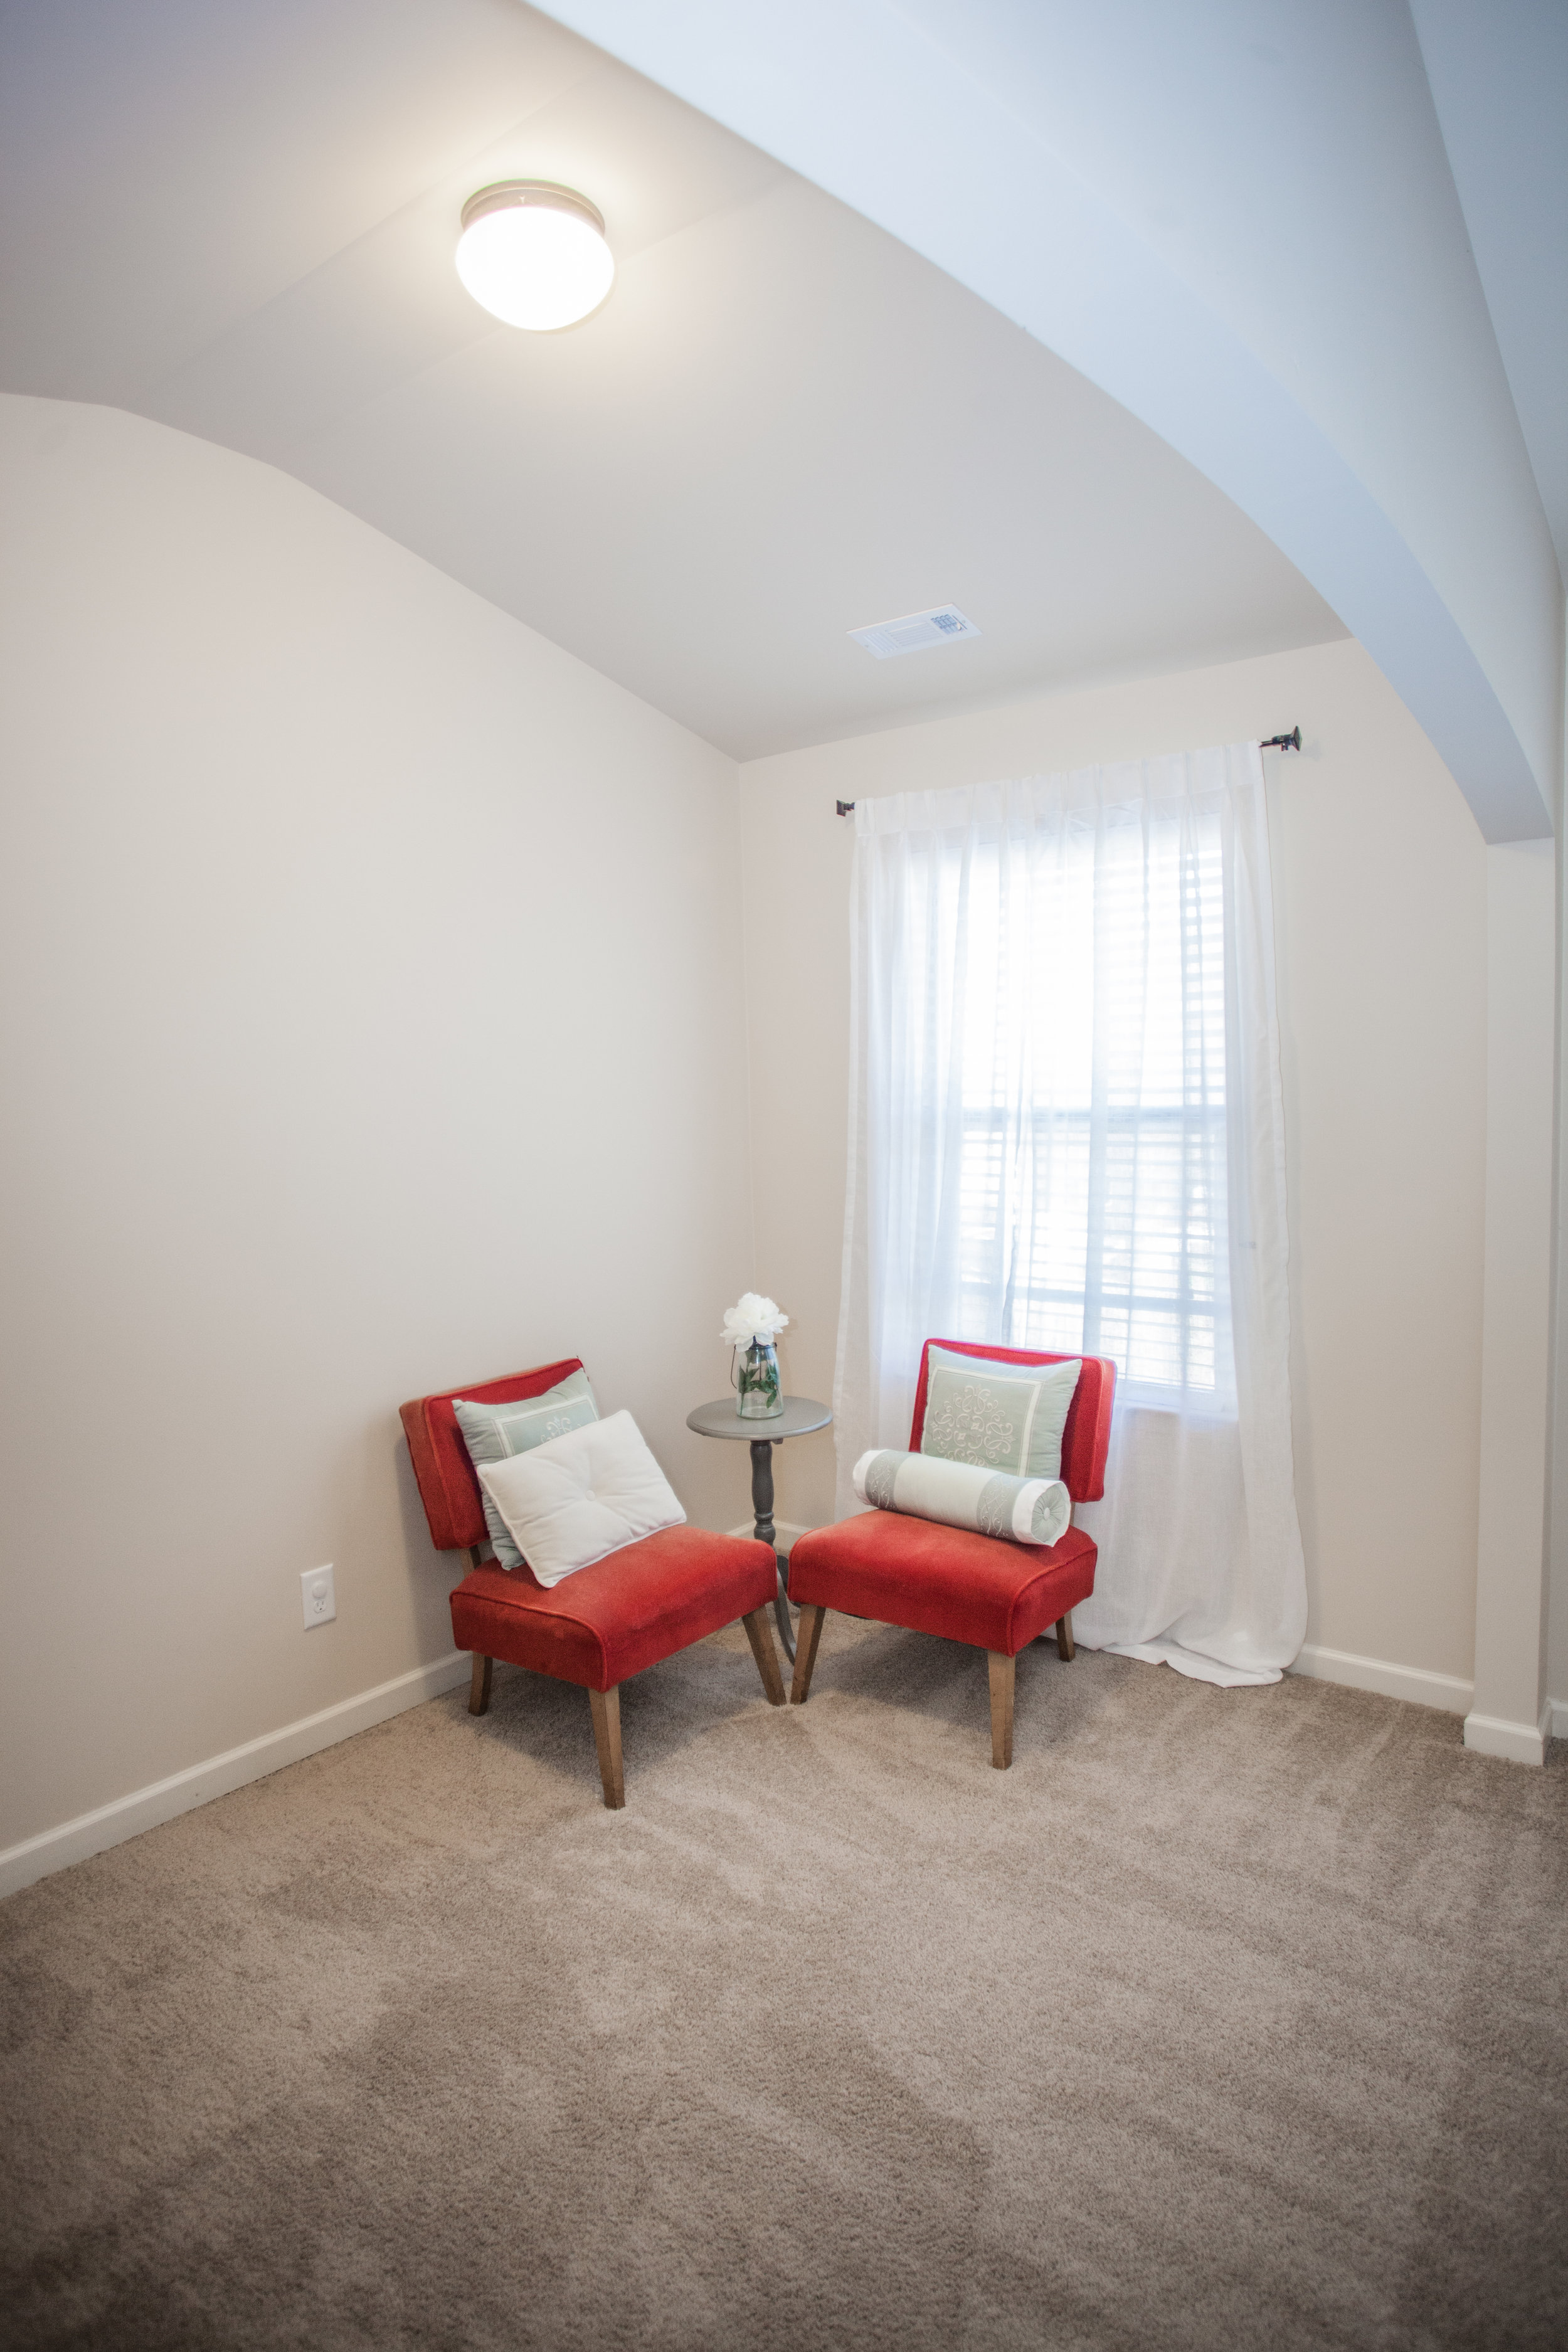 woodstock-ga-house-for-sale-wingard-real-estate-under-300k-27.jpg